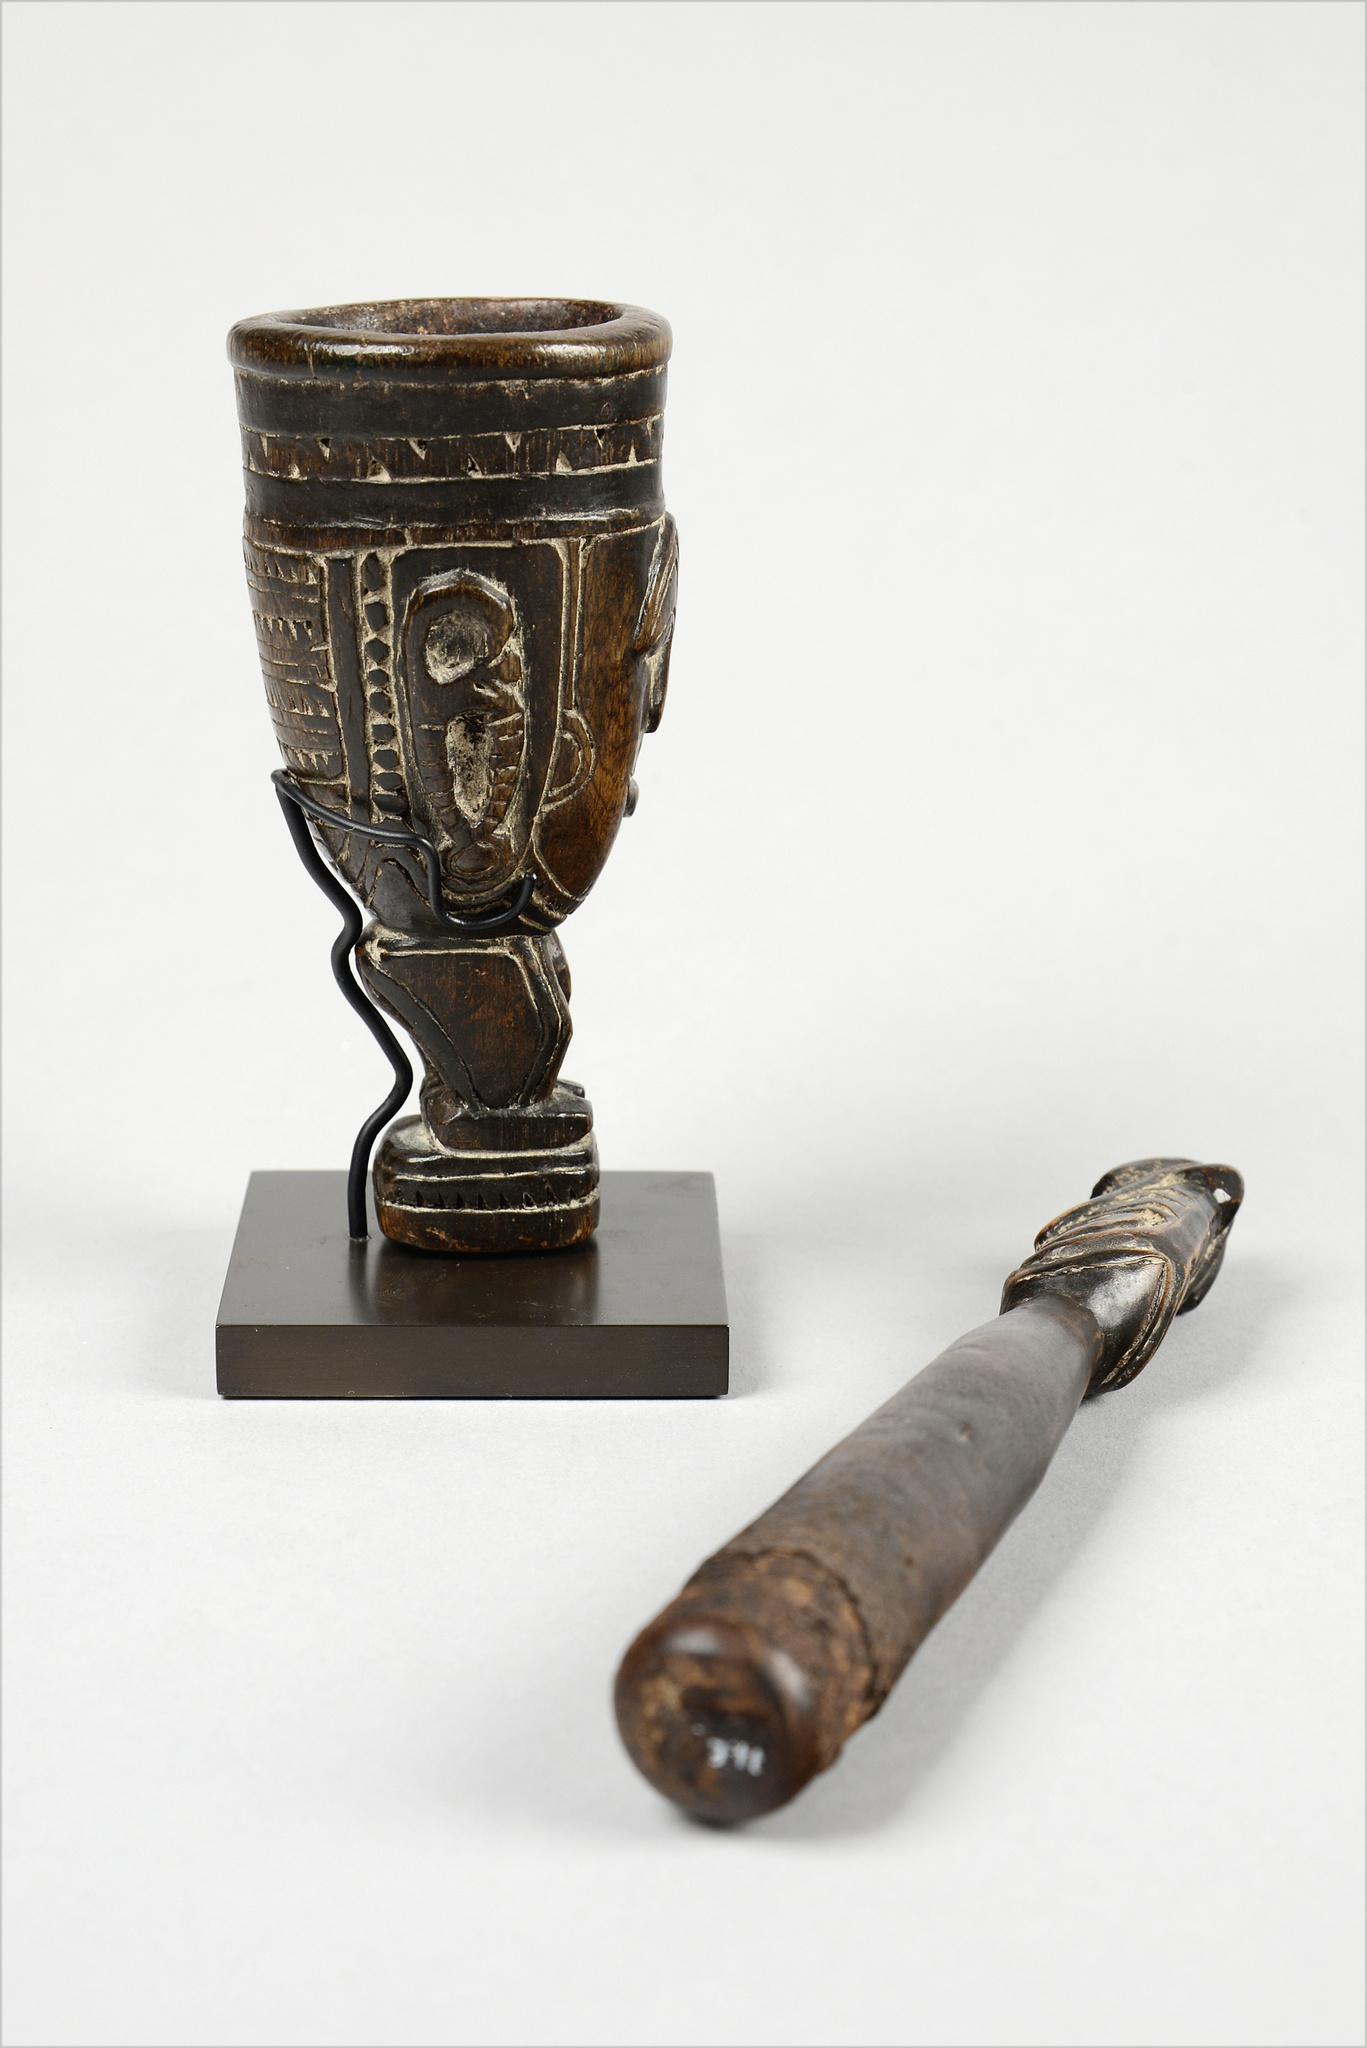 Anthropomorphic mortar and pestle